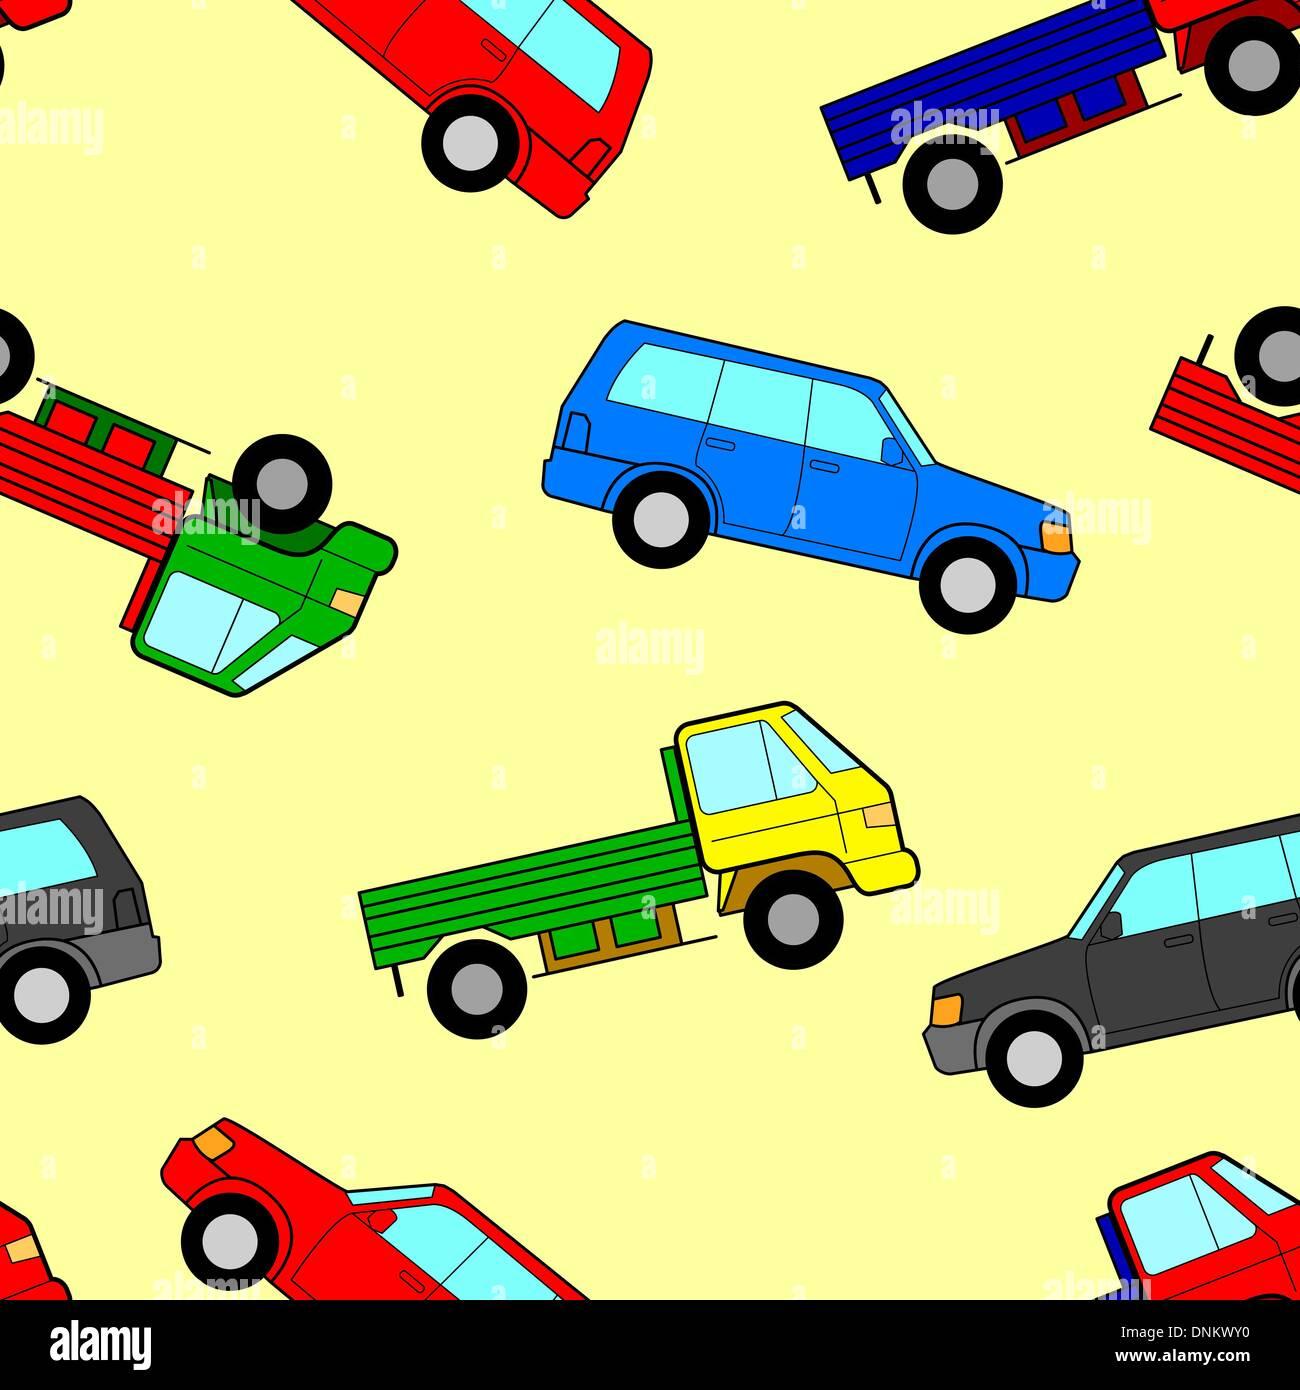 Car seamless wallpaper, vector illustration - Stock Image